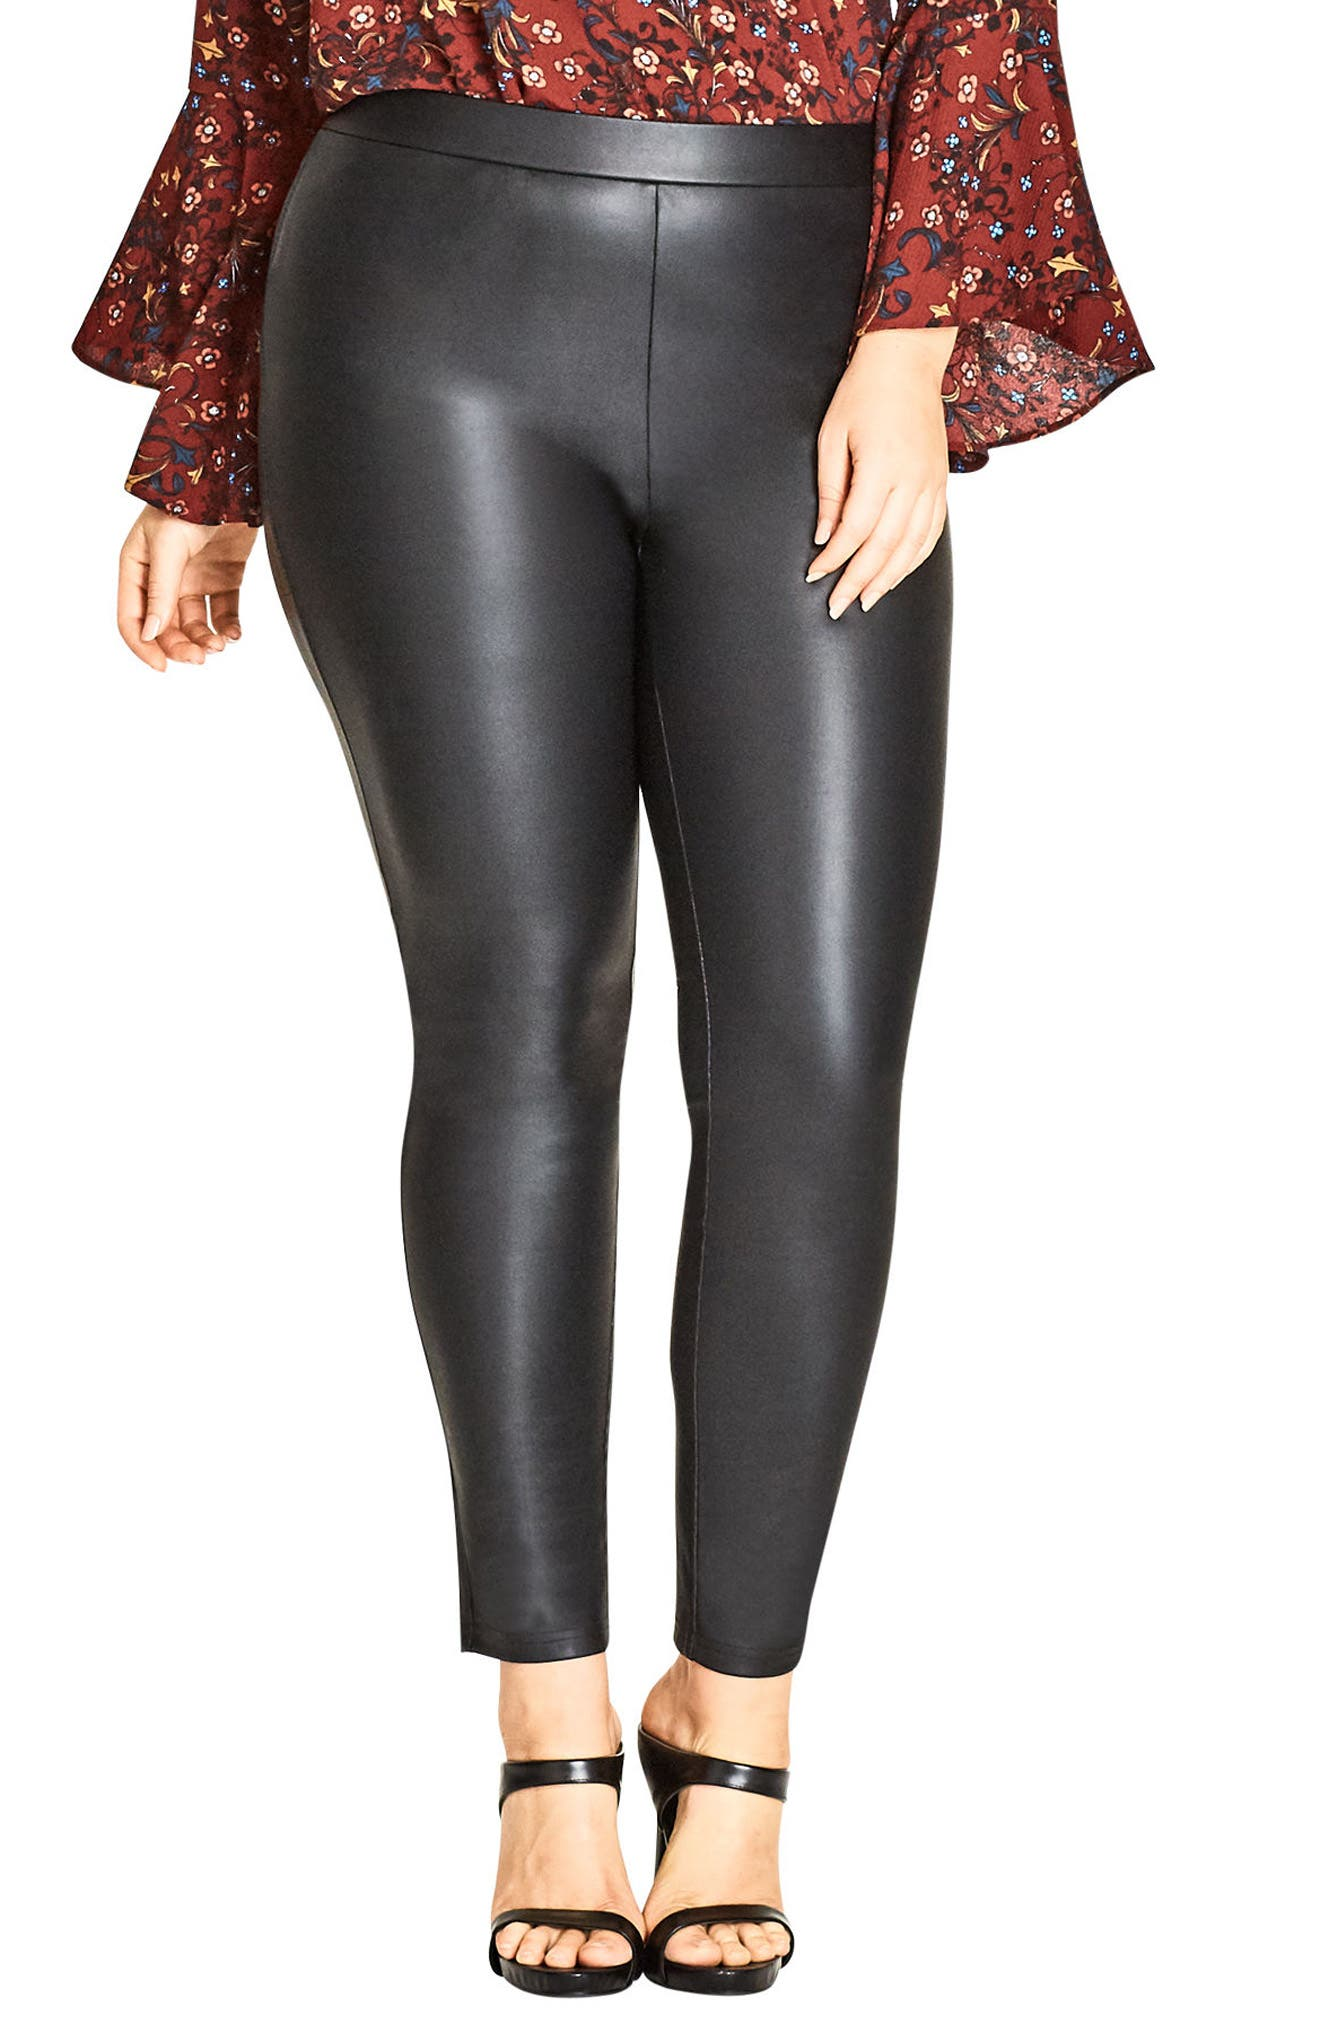 Alternate Image 1 Selected - City Chic Asha Wet Look Leggings (Plus Size)